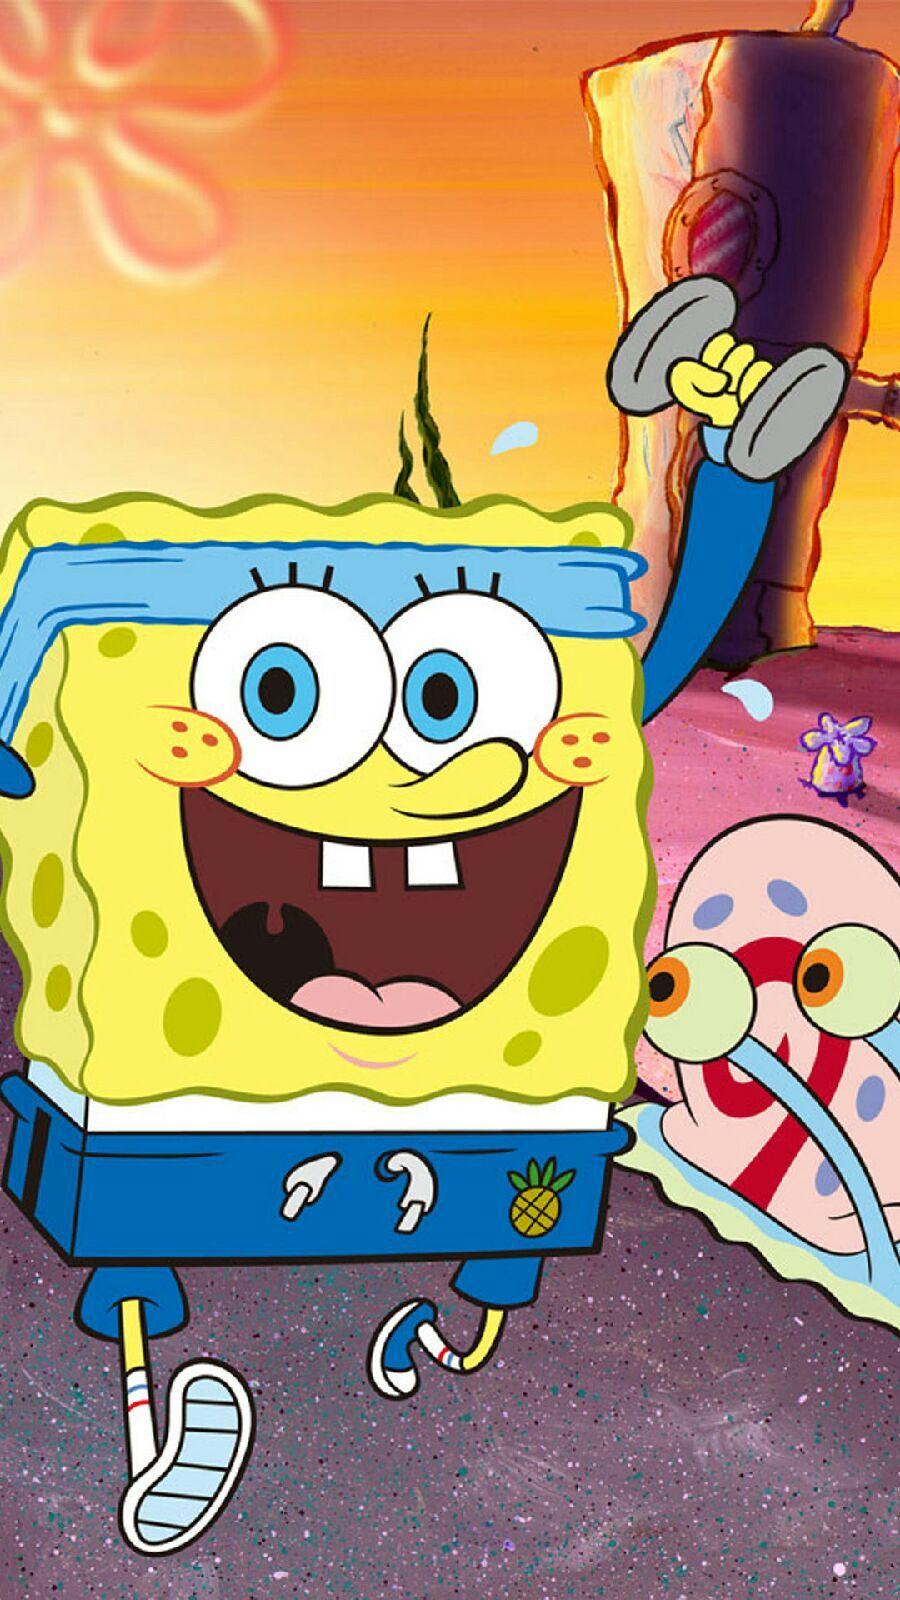 Spongebob Wallpaper For Samsung J2 2354337 Hd Wallpaper Backgrounds Download